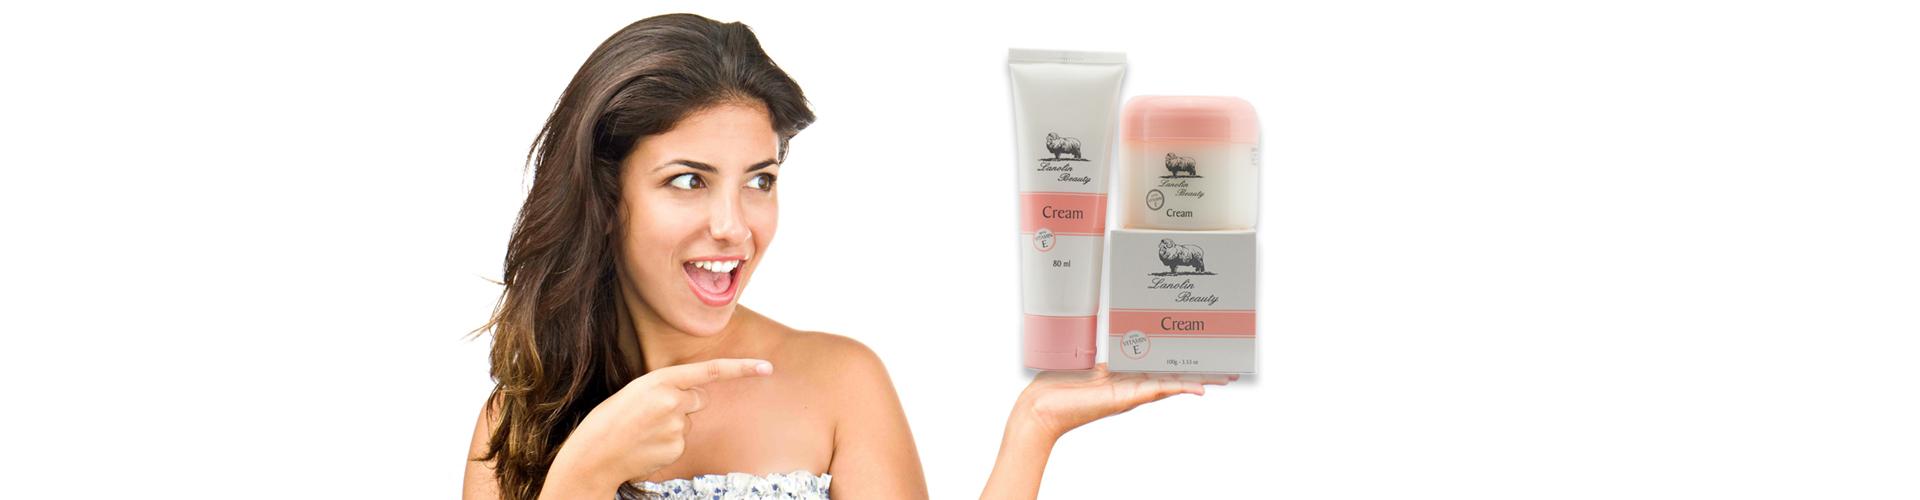 cream-on-girls-hand.jpg